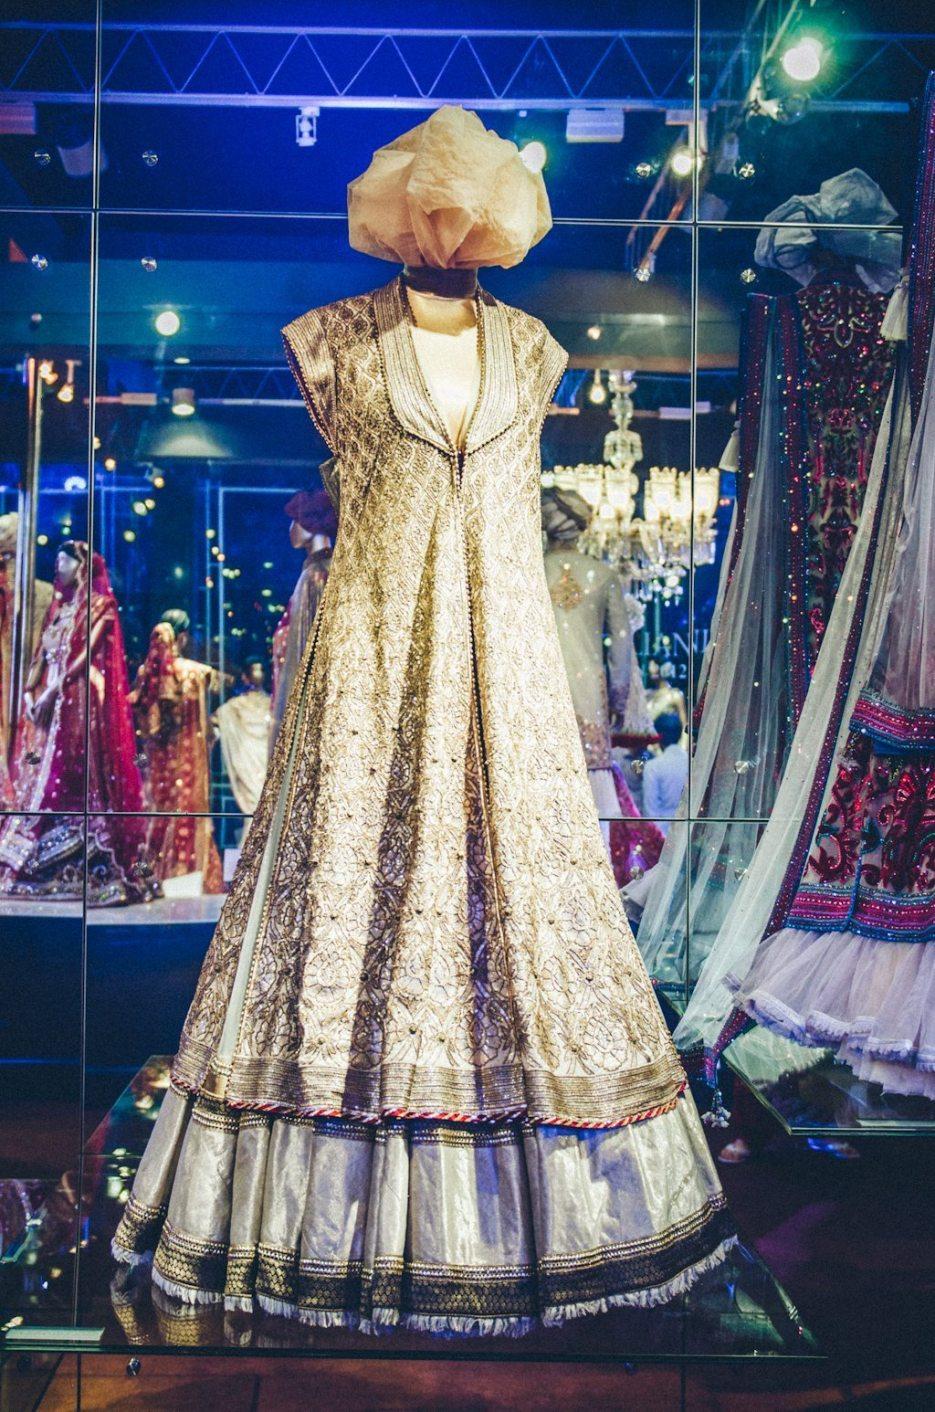 Tarun-Tahiliani-Bridal-Couture-Wedding-Wear-Fashion-Designer-Photographer-Naina-Knottytales-43.jpg